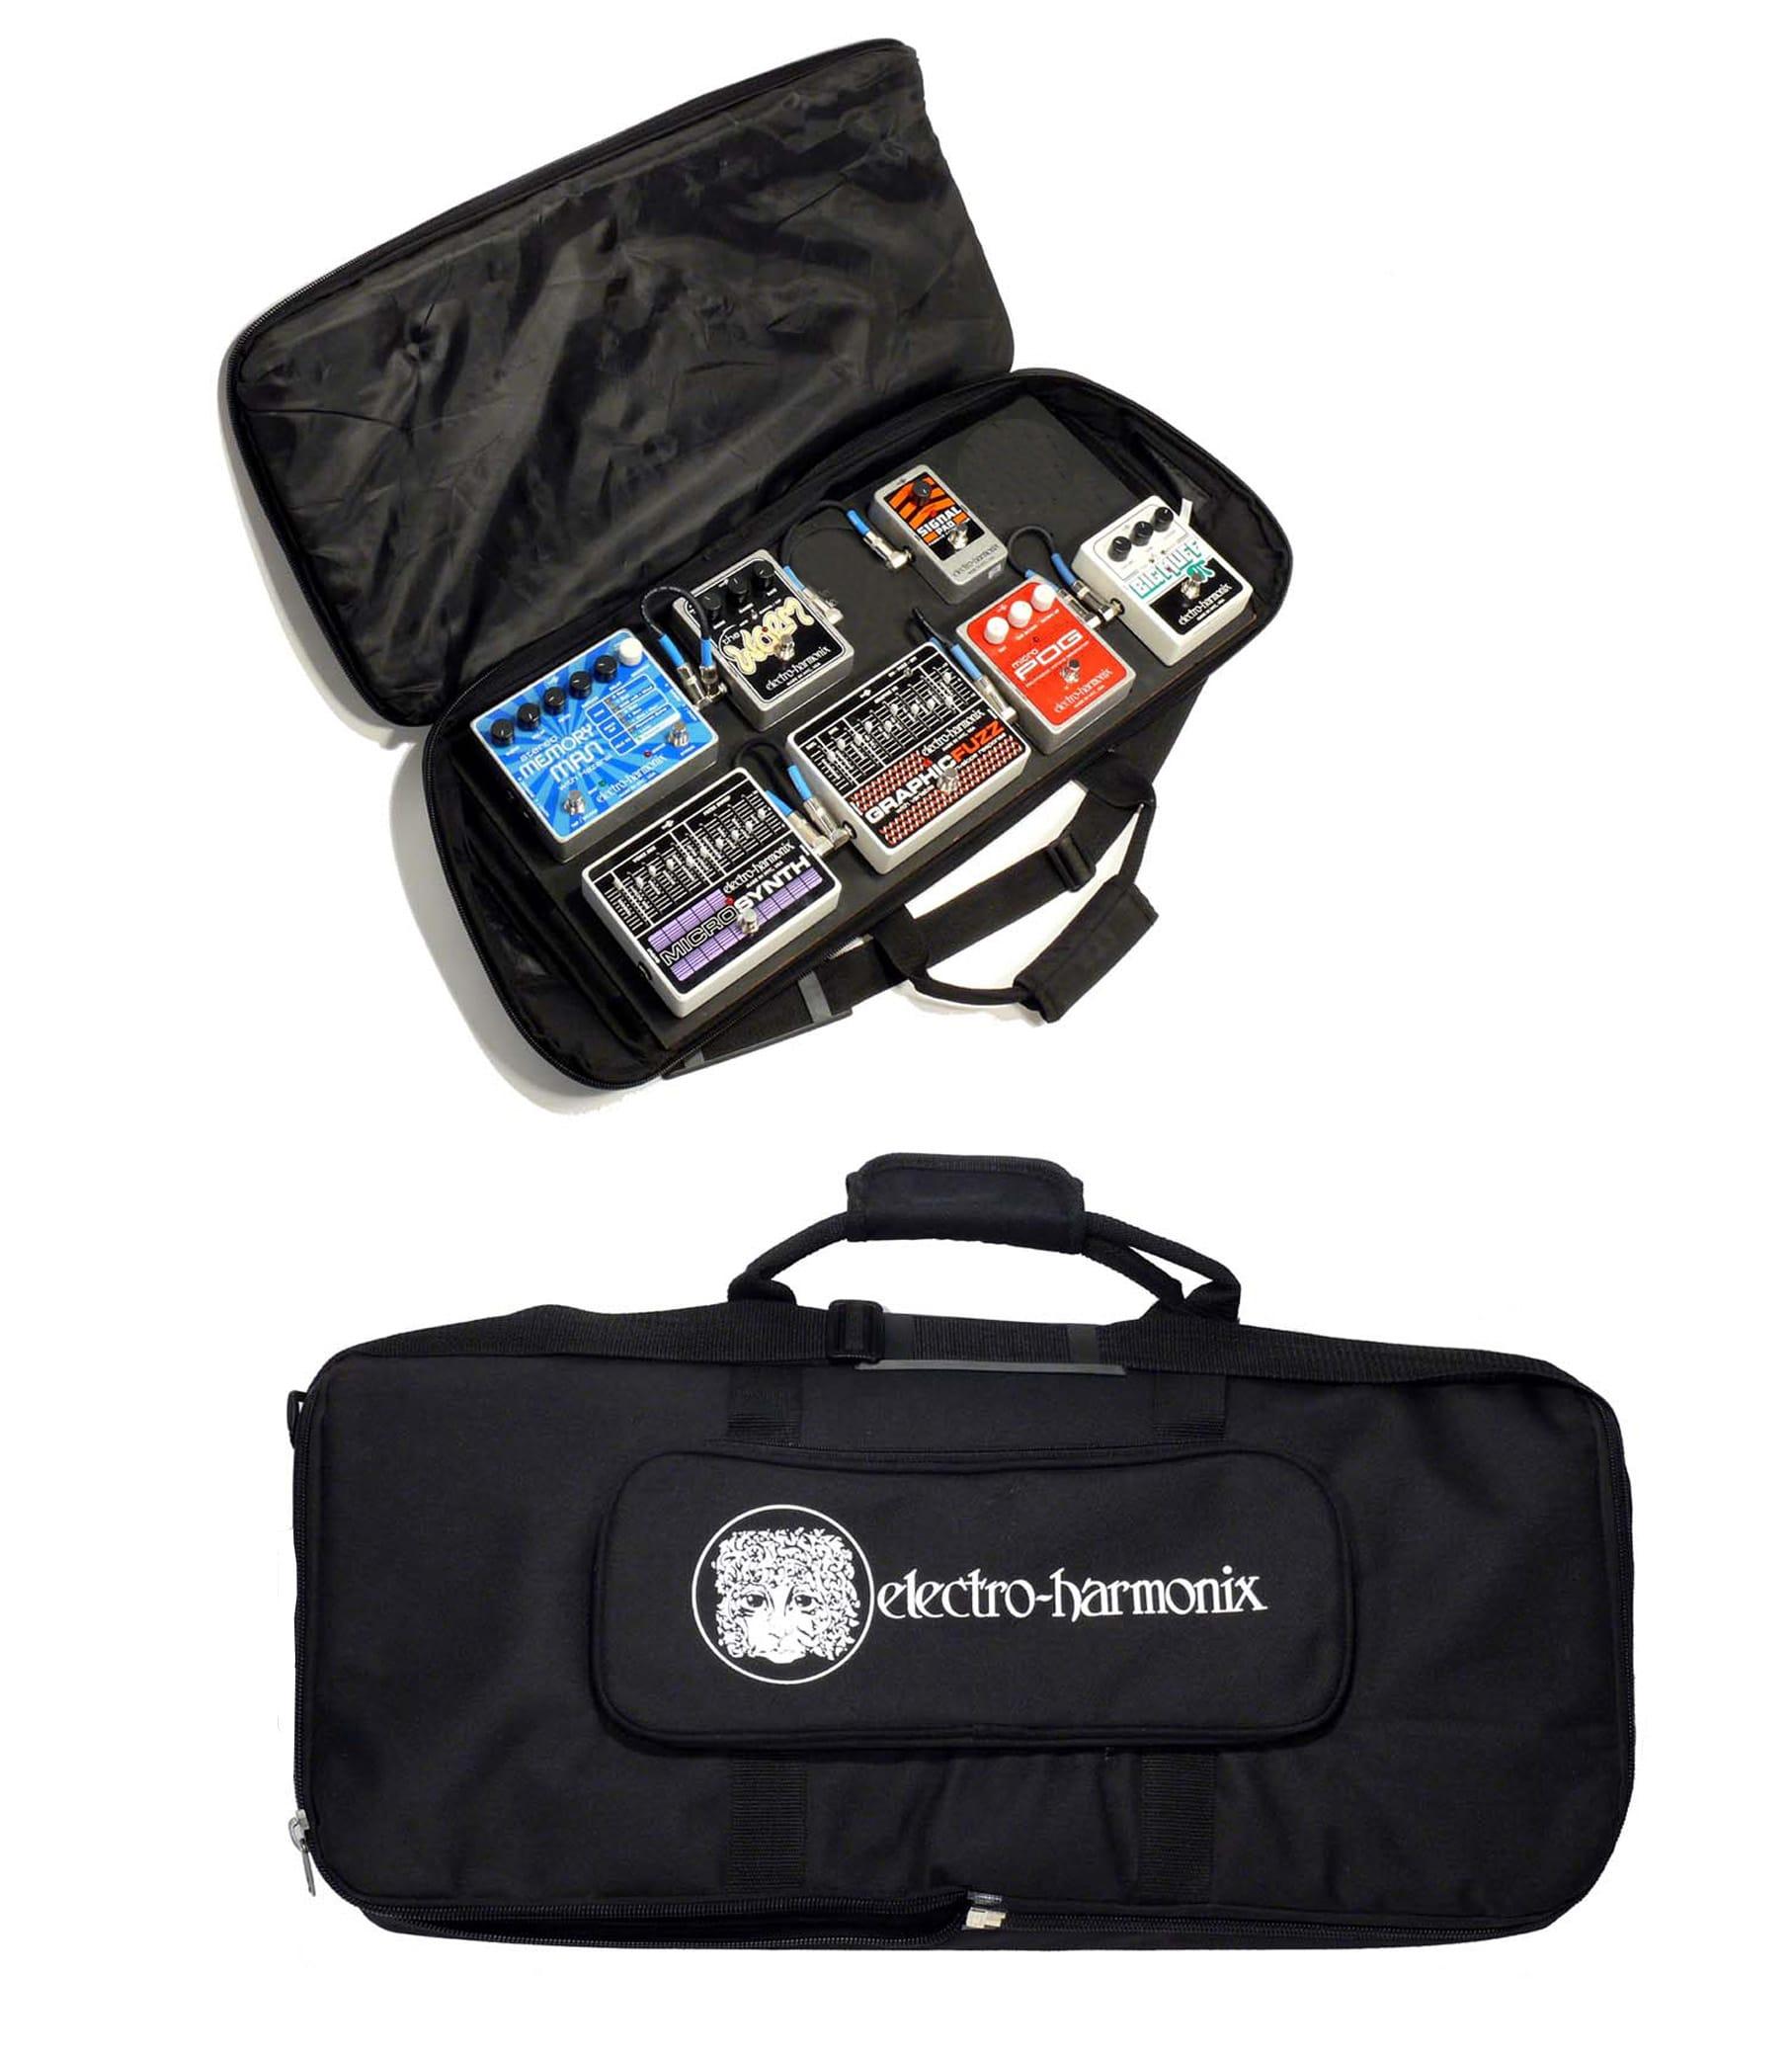 buy electroharmonix pedal board bag